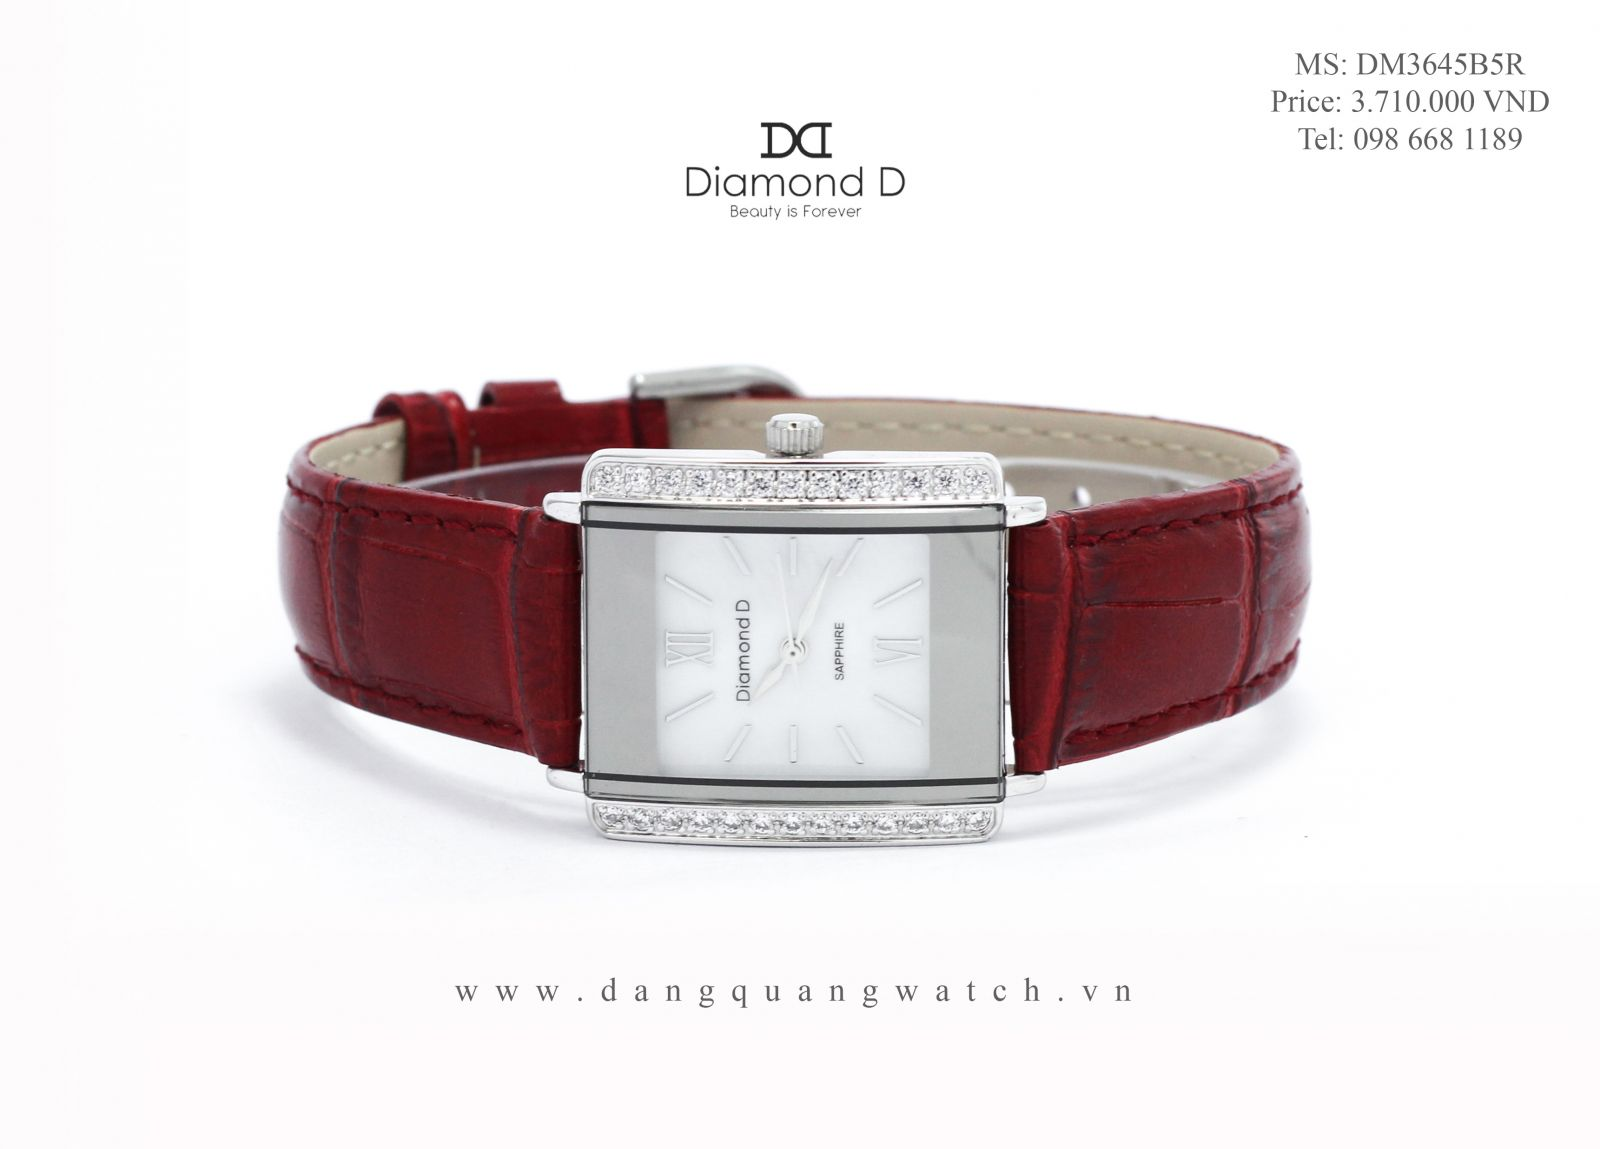 đồng hồ diamond d DM3645B5R